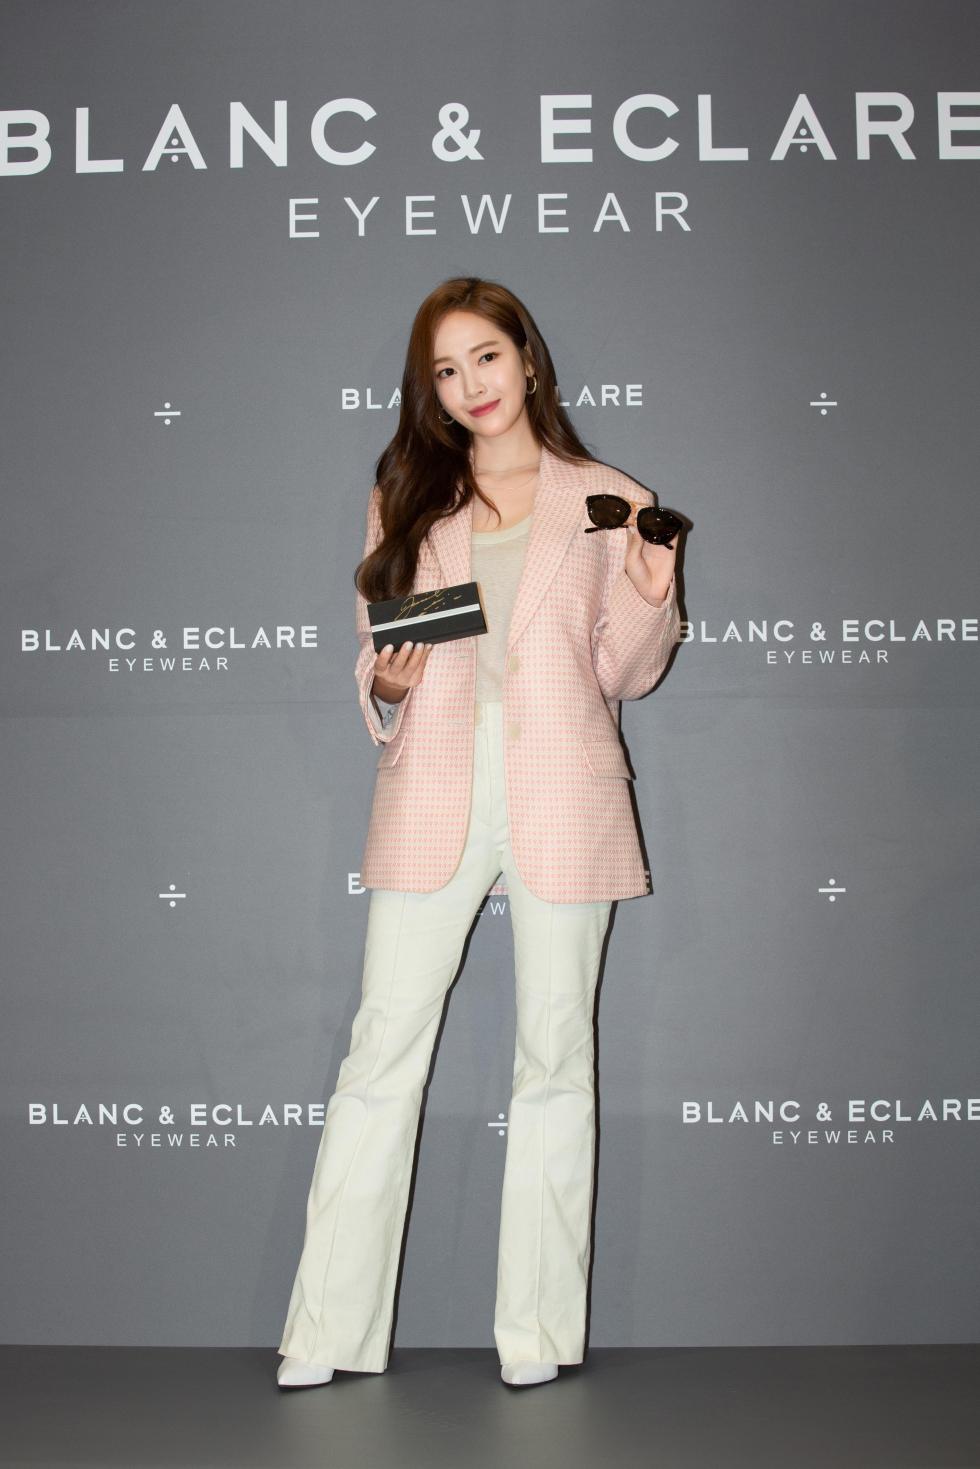 《Blanc _ Eclare Eyewear》活動現場品牌創意總監鄭秀妍Jessica_1